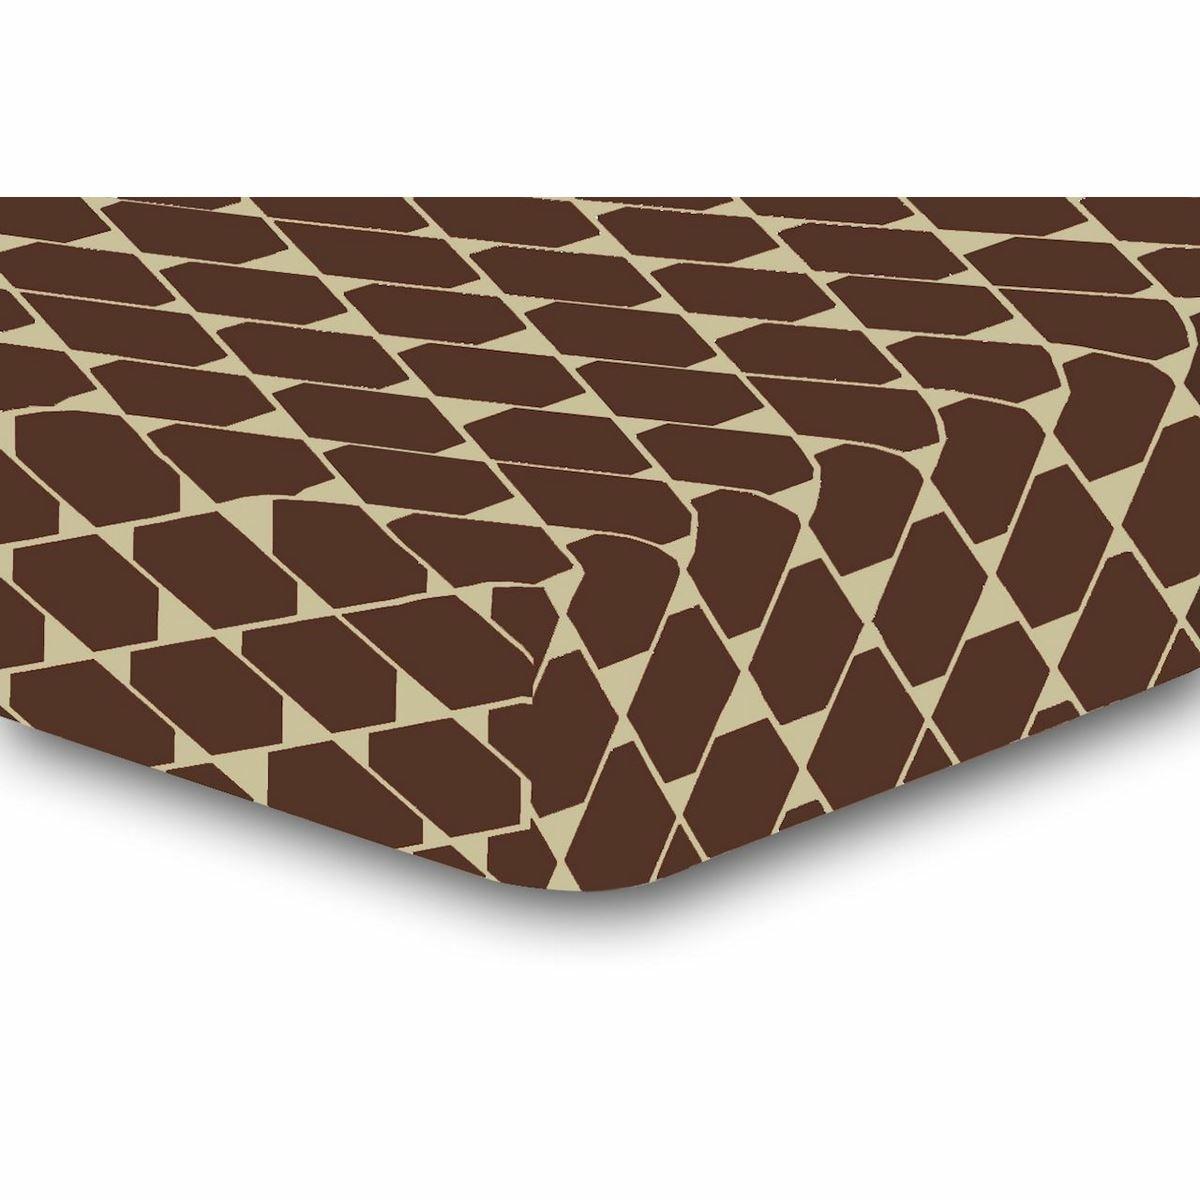 DecoKing Prostěradlo Rhombuses hnědá S2, 180 x 200 cm